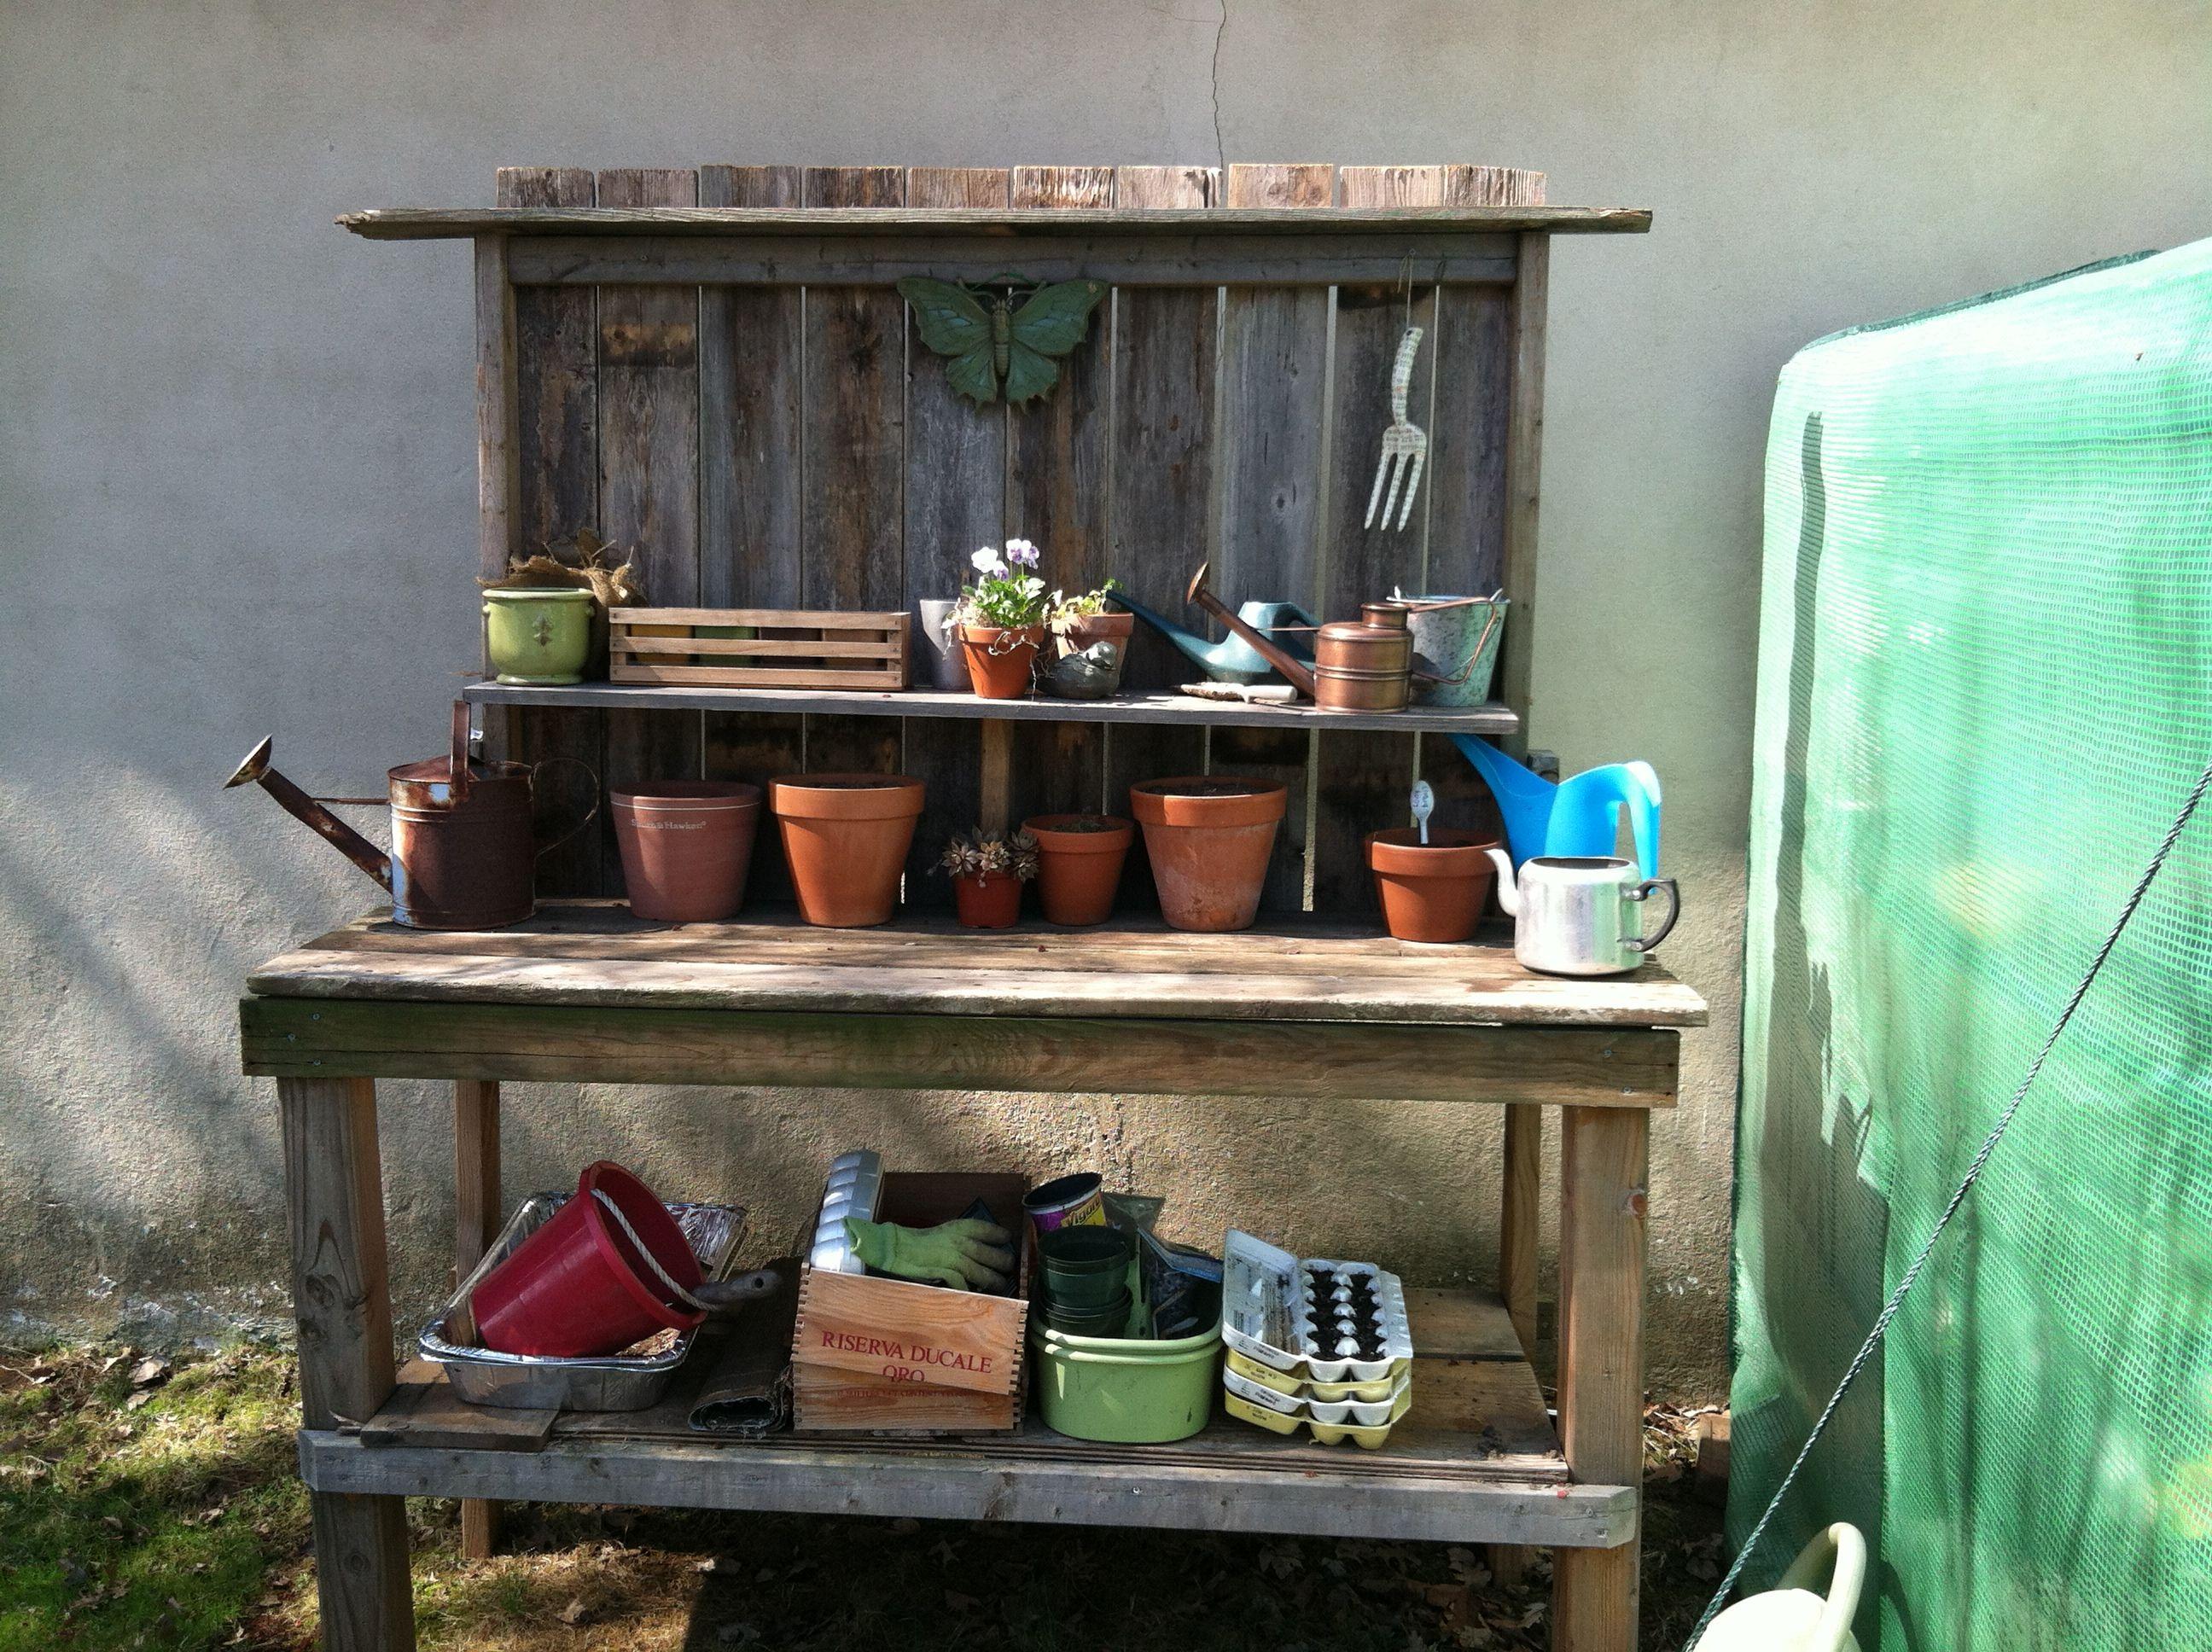 New potting bench